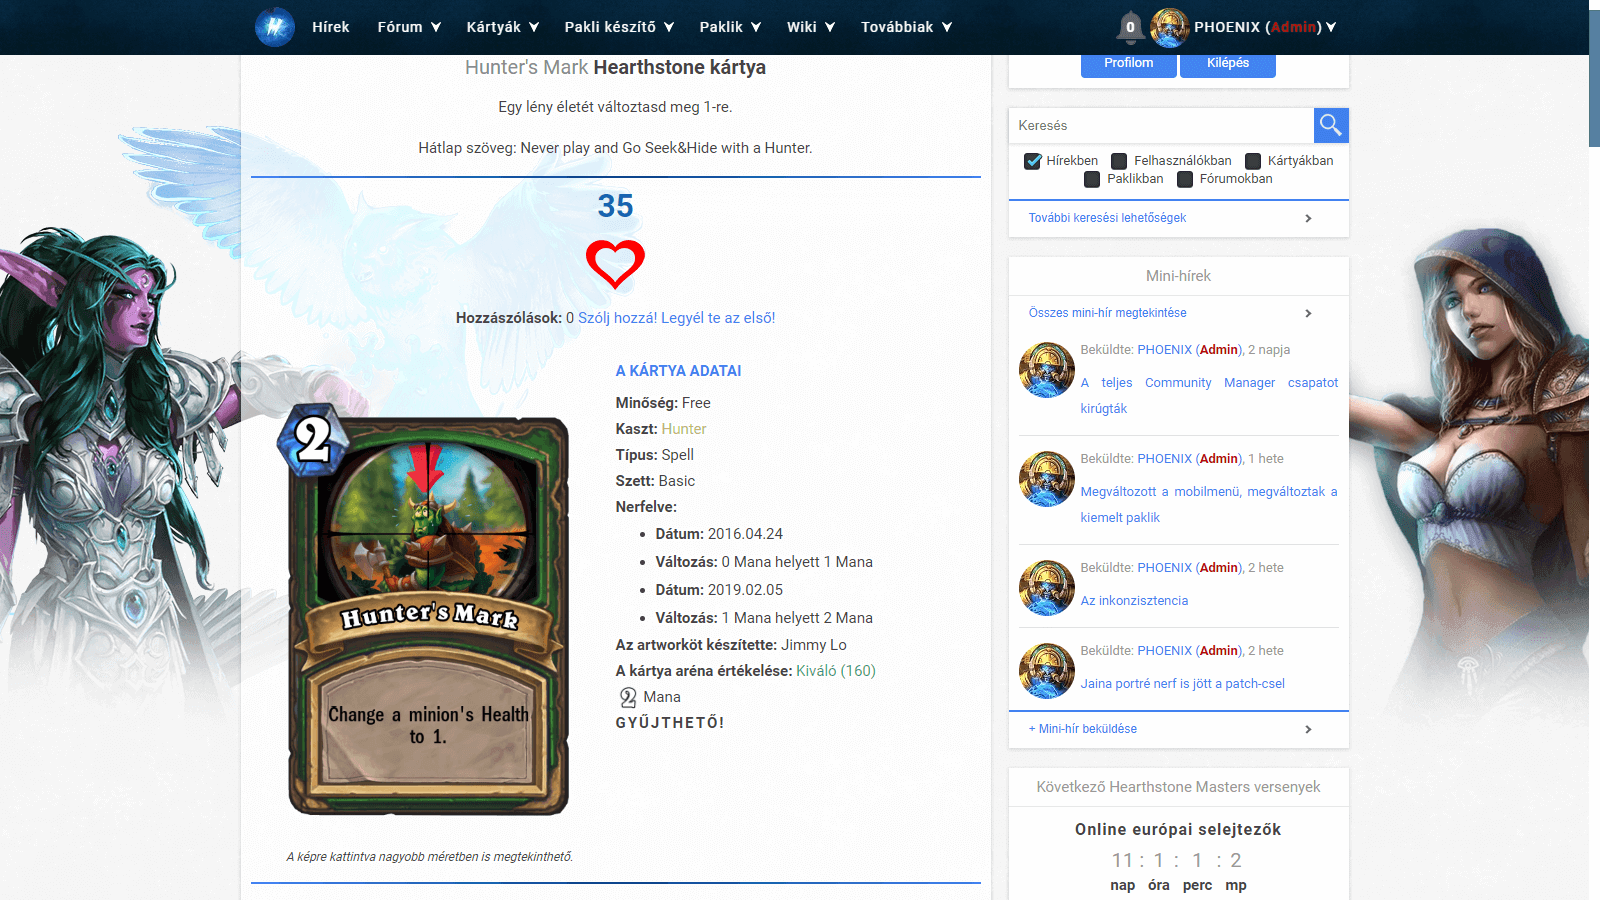 Hearthstone Hungary kártyák